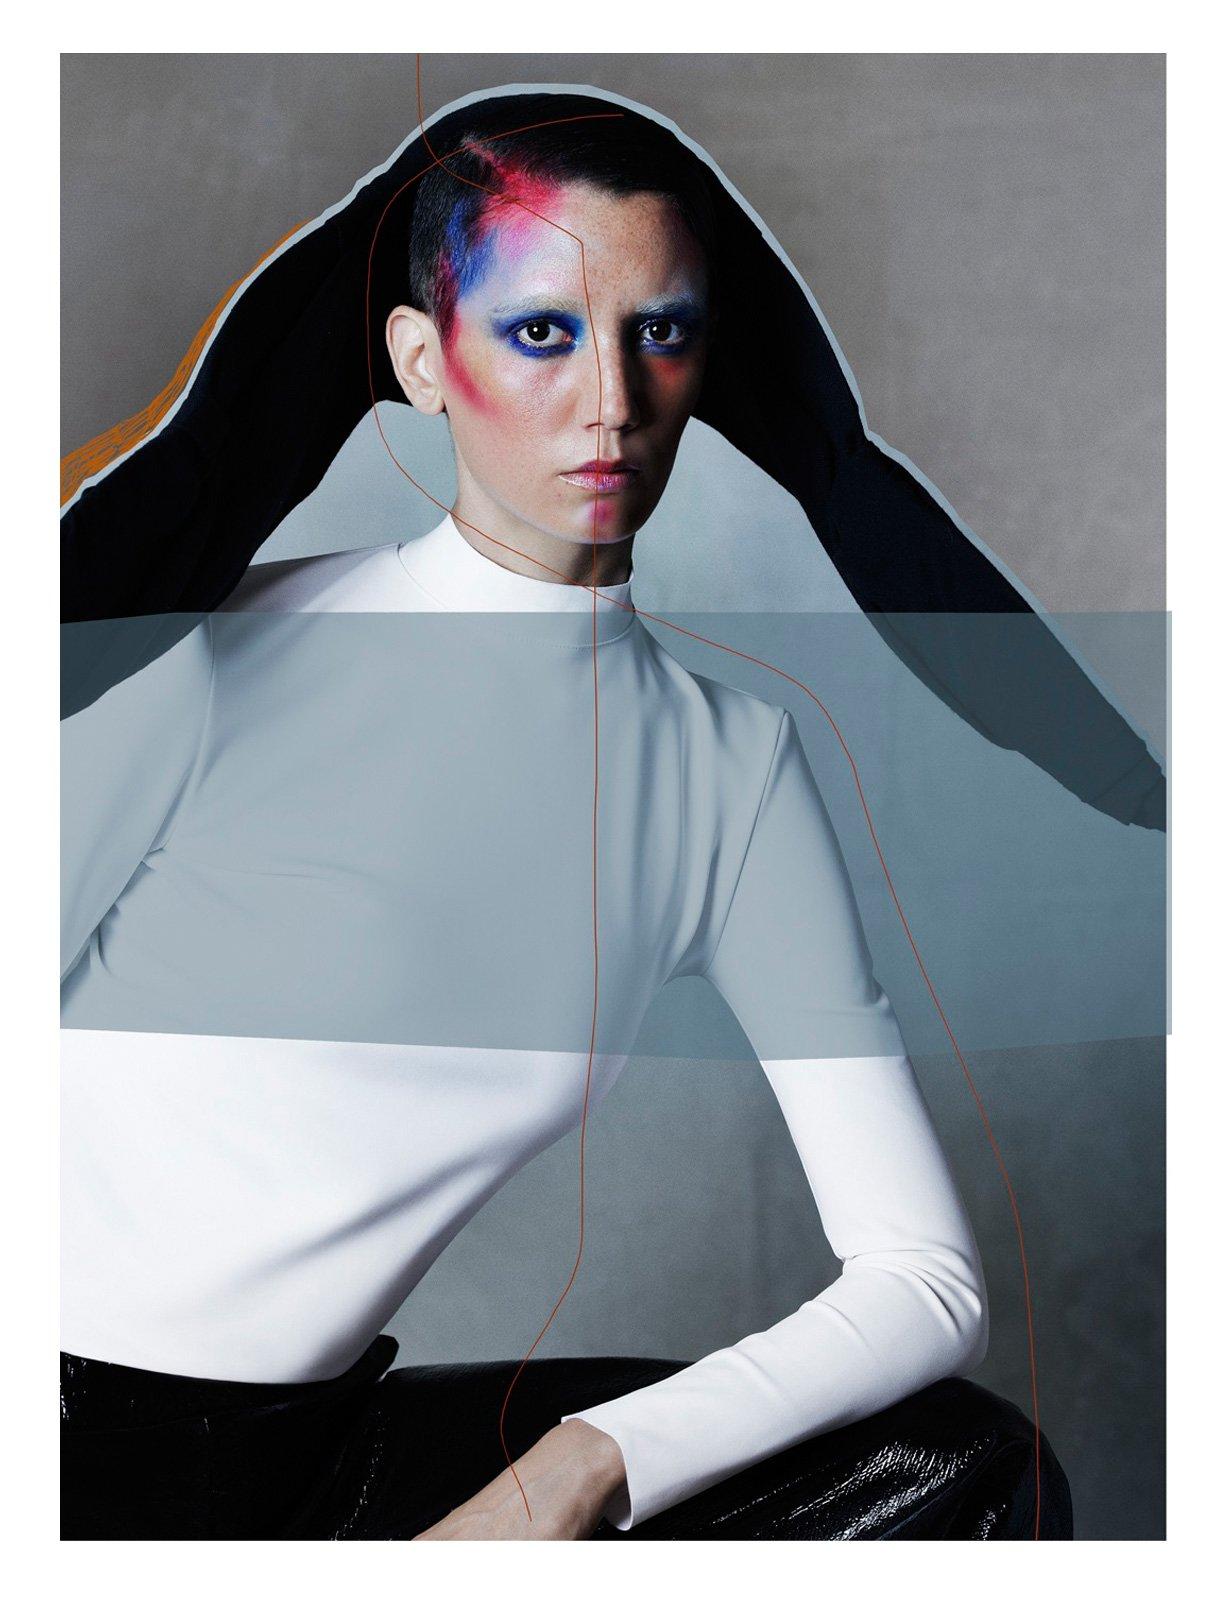 ignant-photo-lea-nielsen-fashion-photography-08